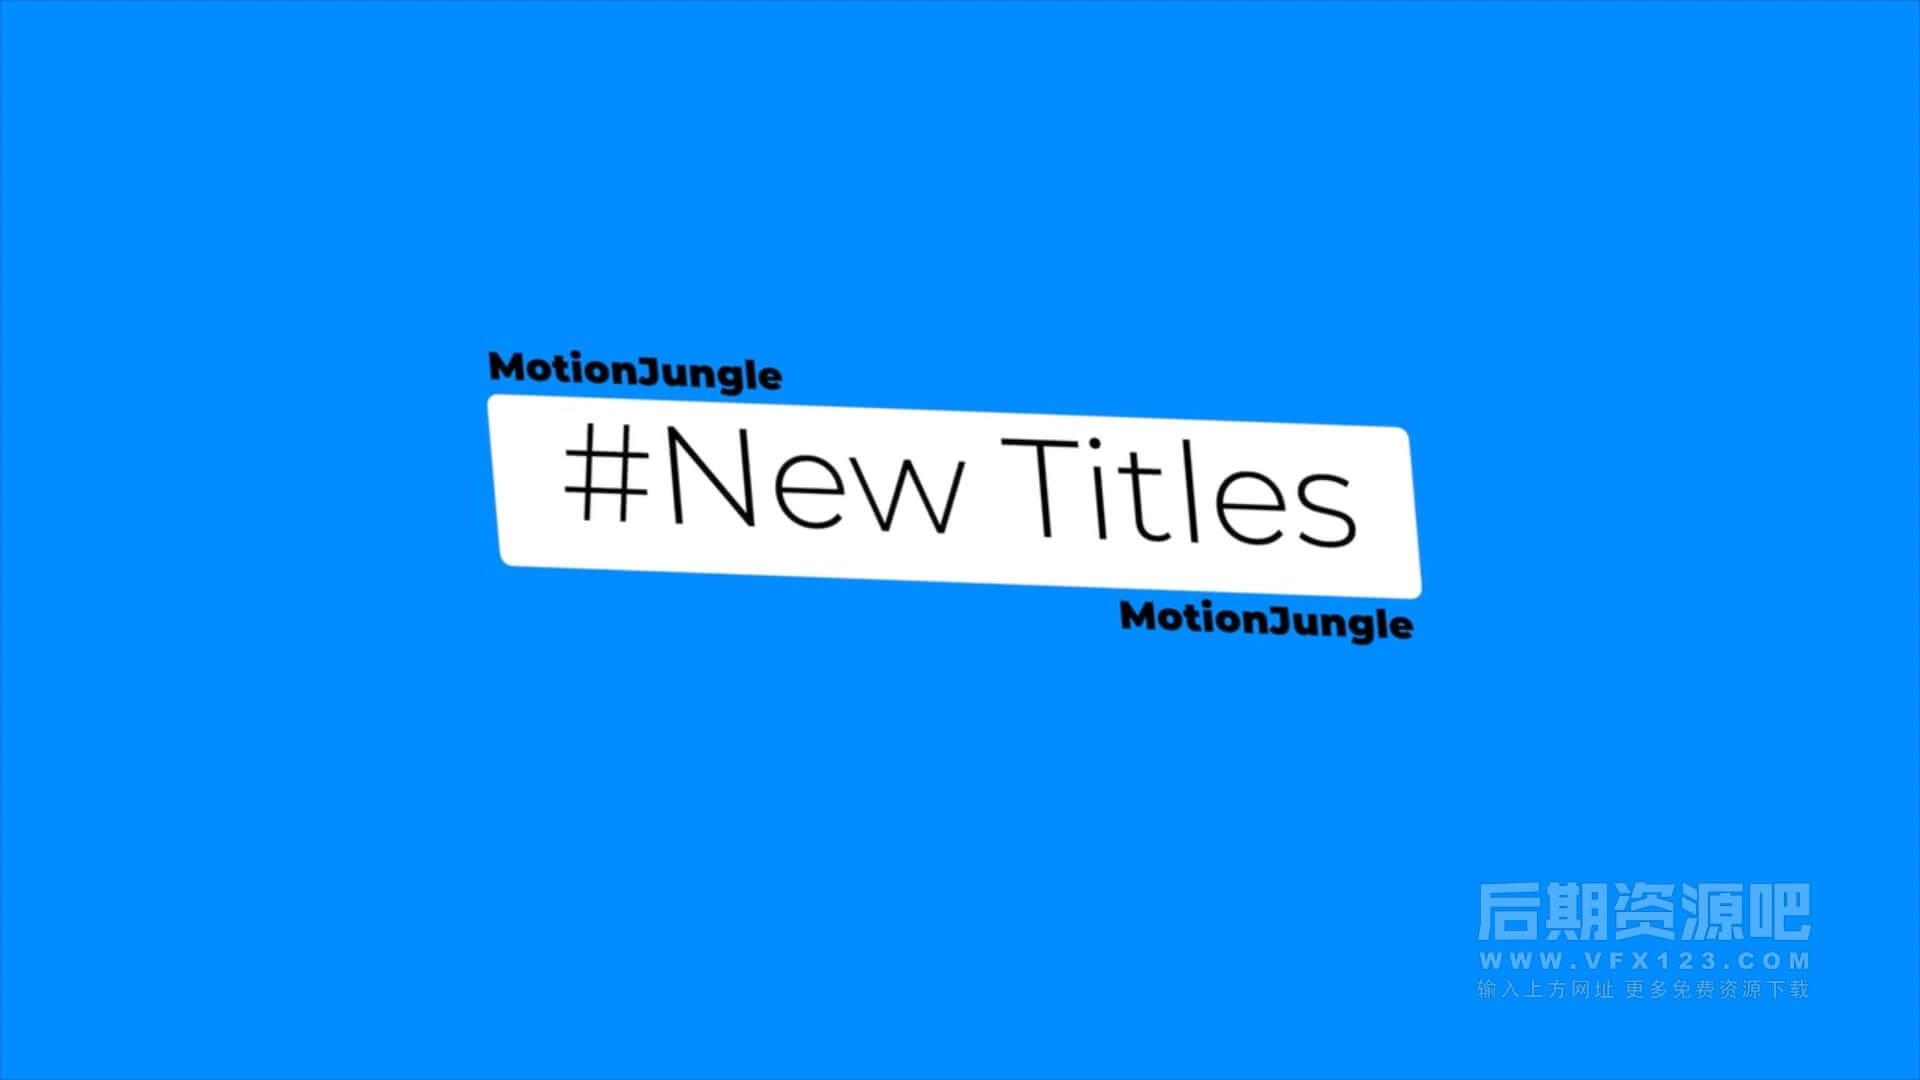 fcpx插件 5组新颖时尚简约标题版式背景动画模板 New Titles